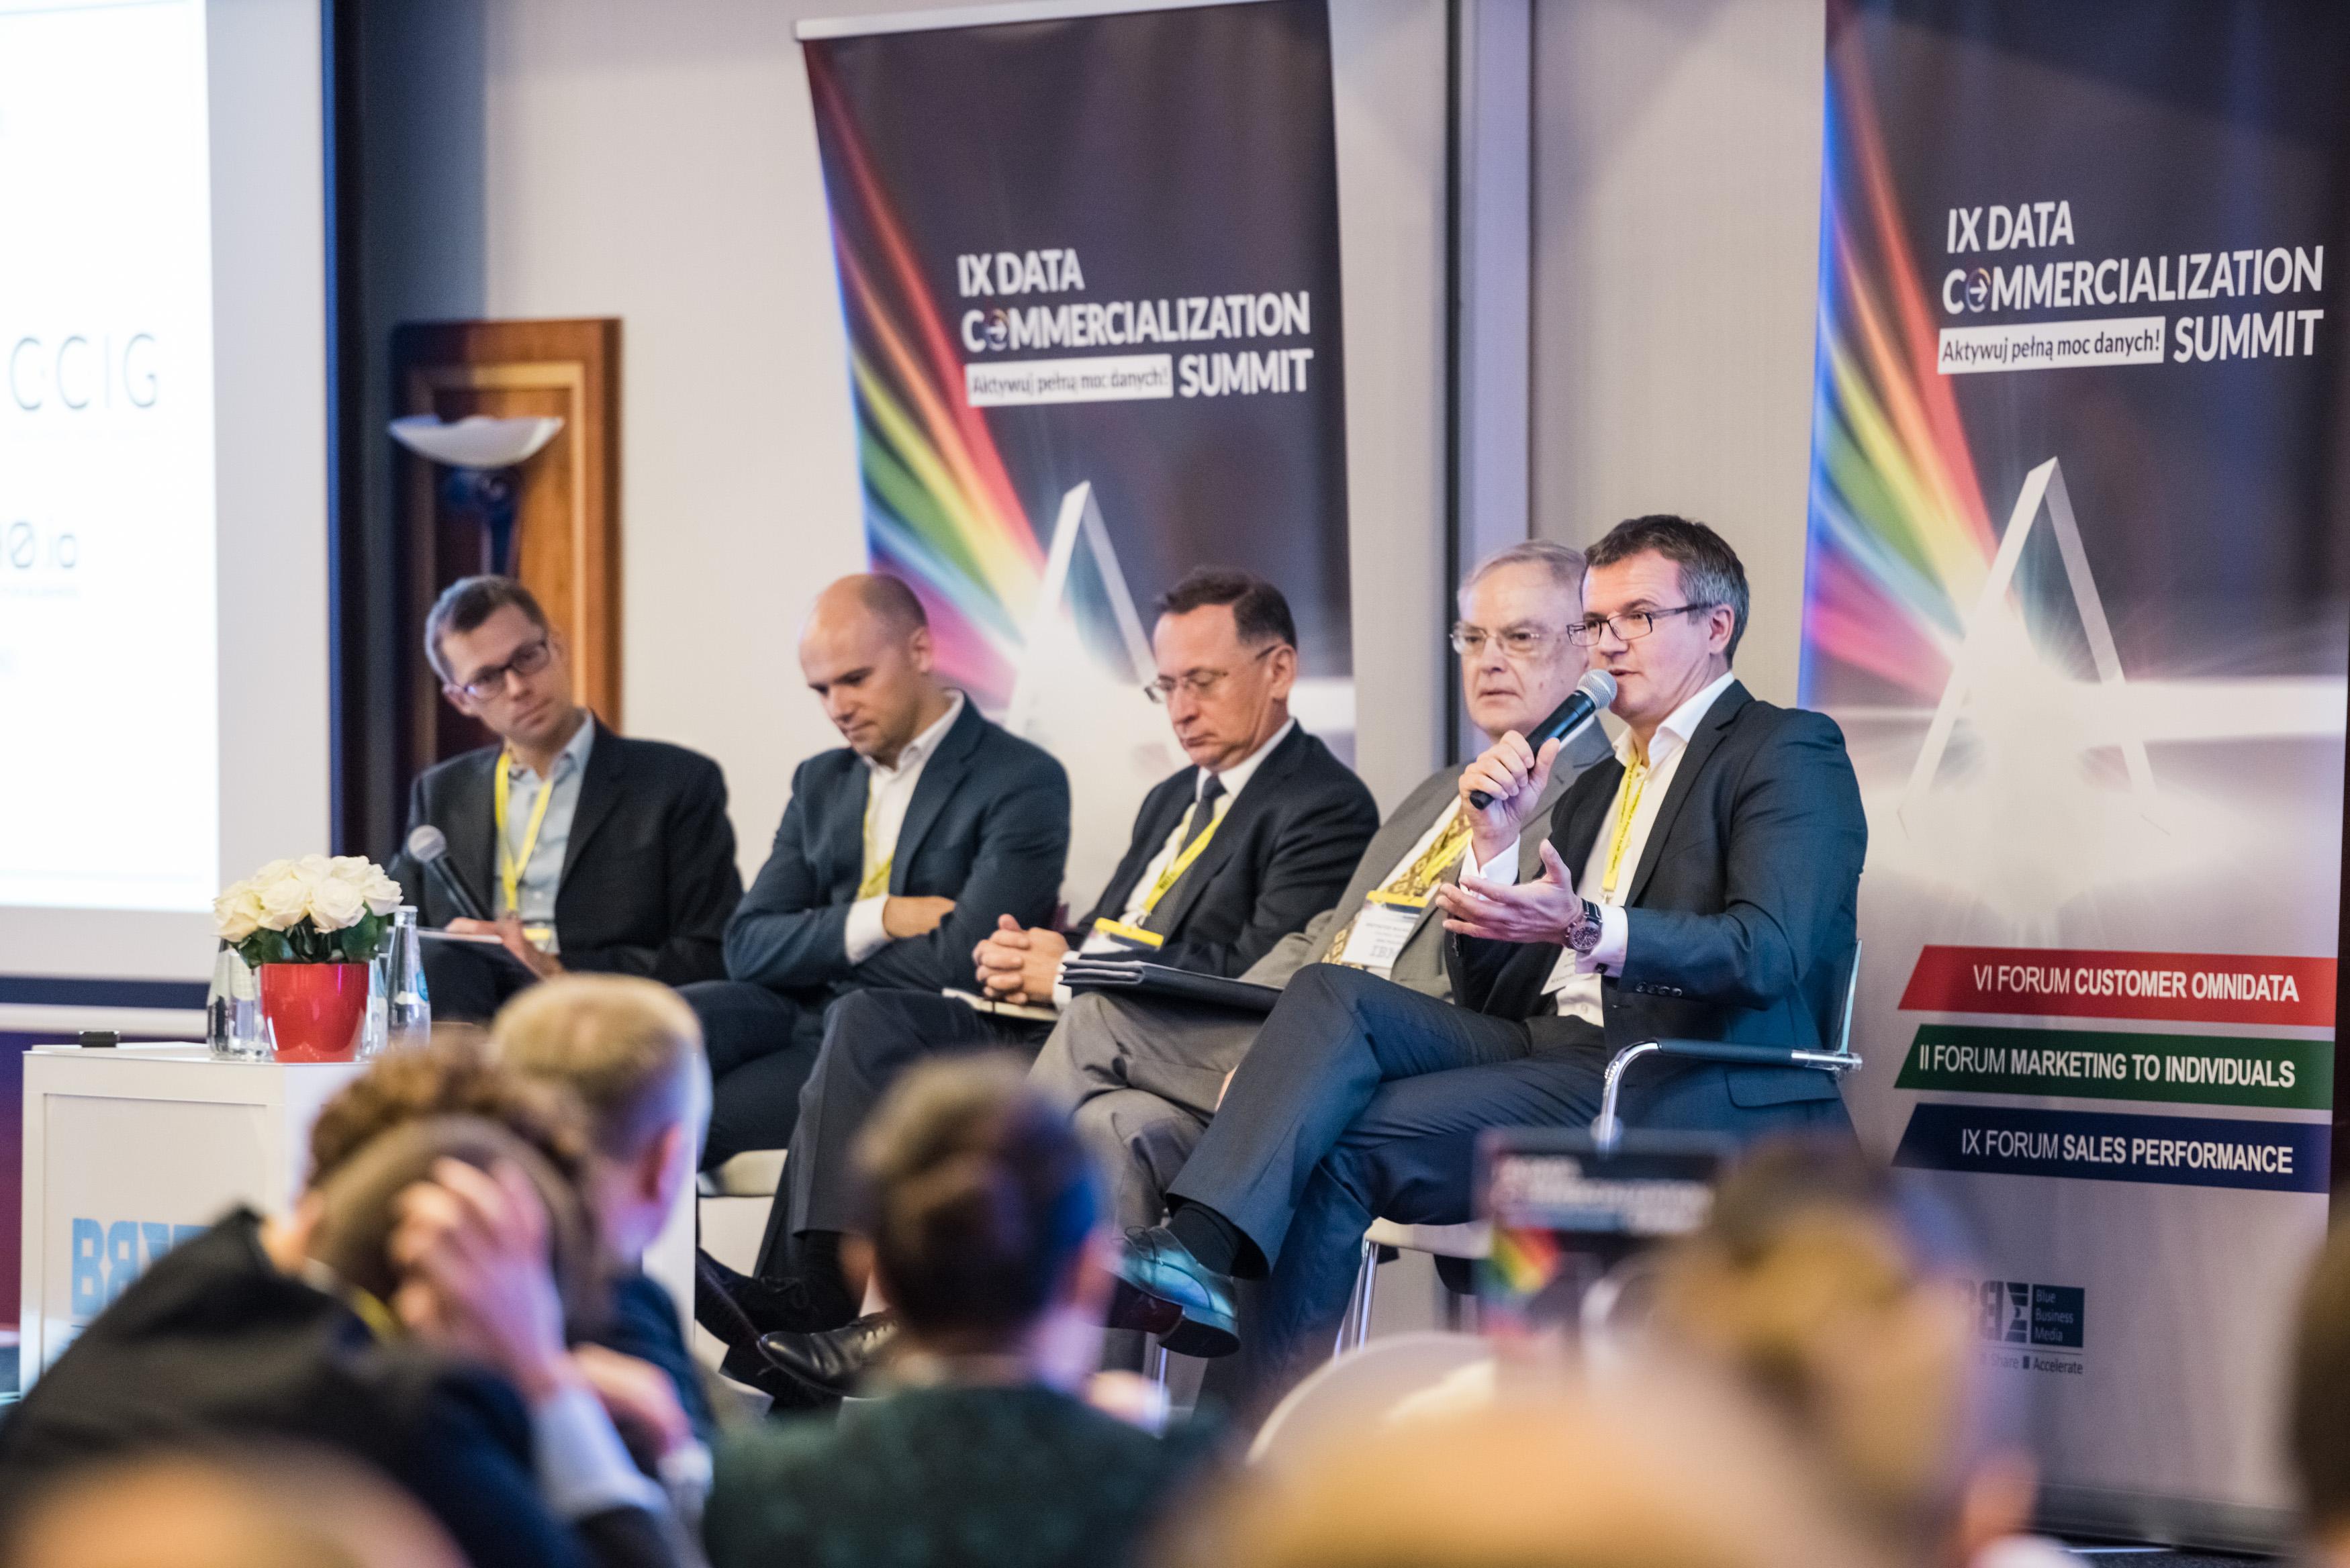 Pic_2 Norbert Biedrzycki Data commercialization summit